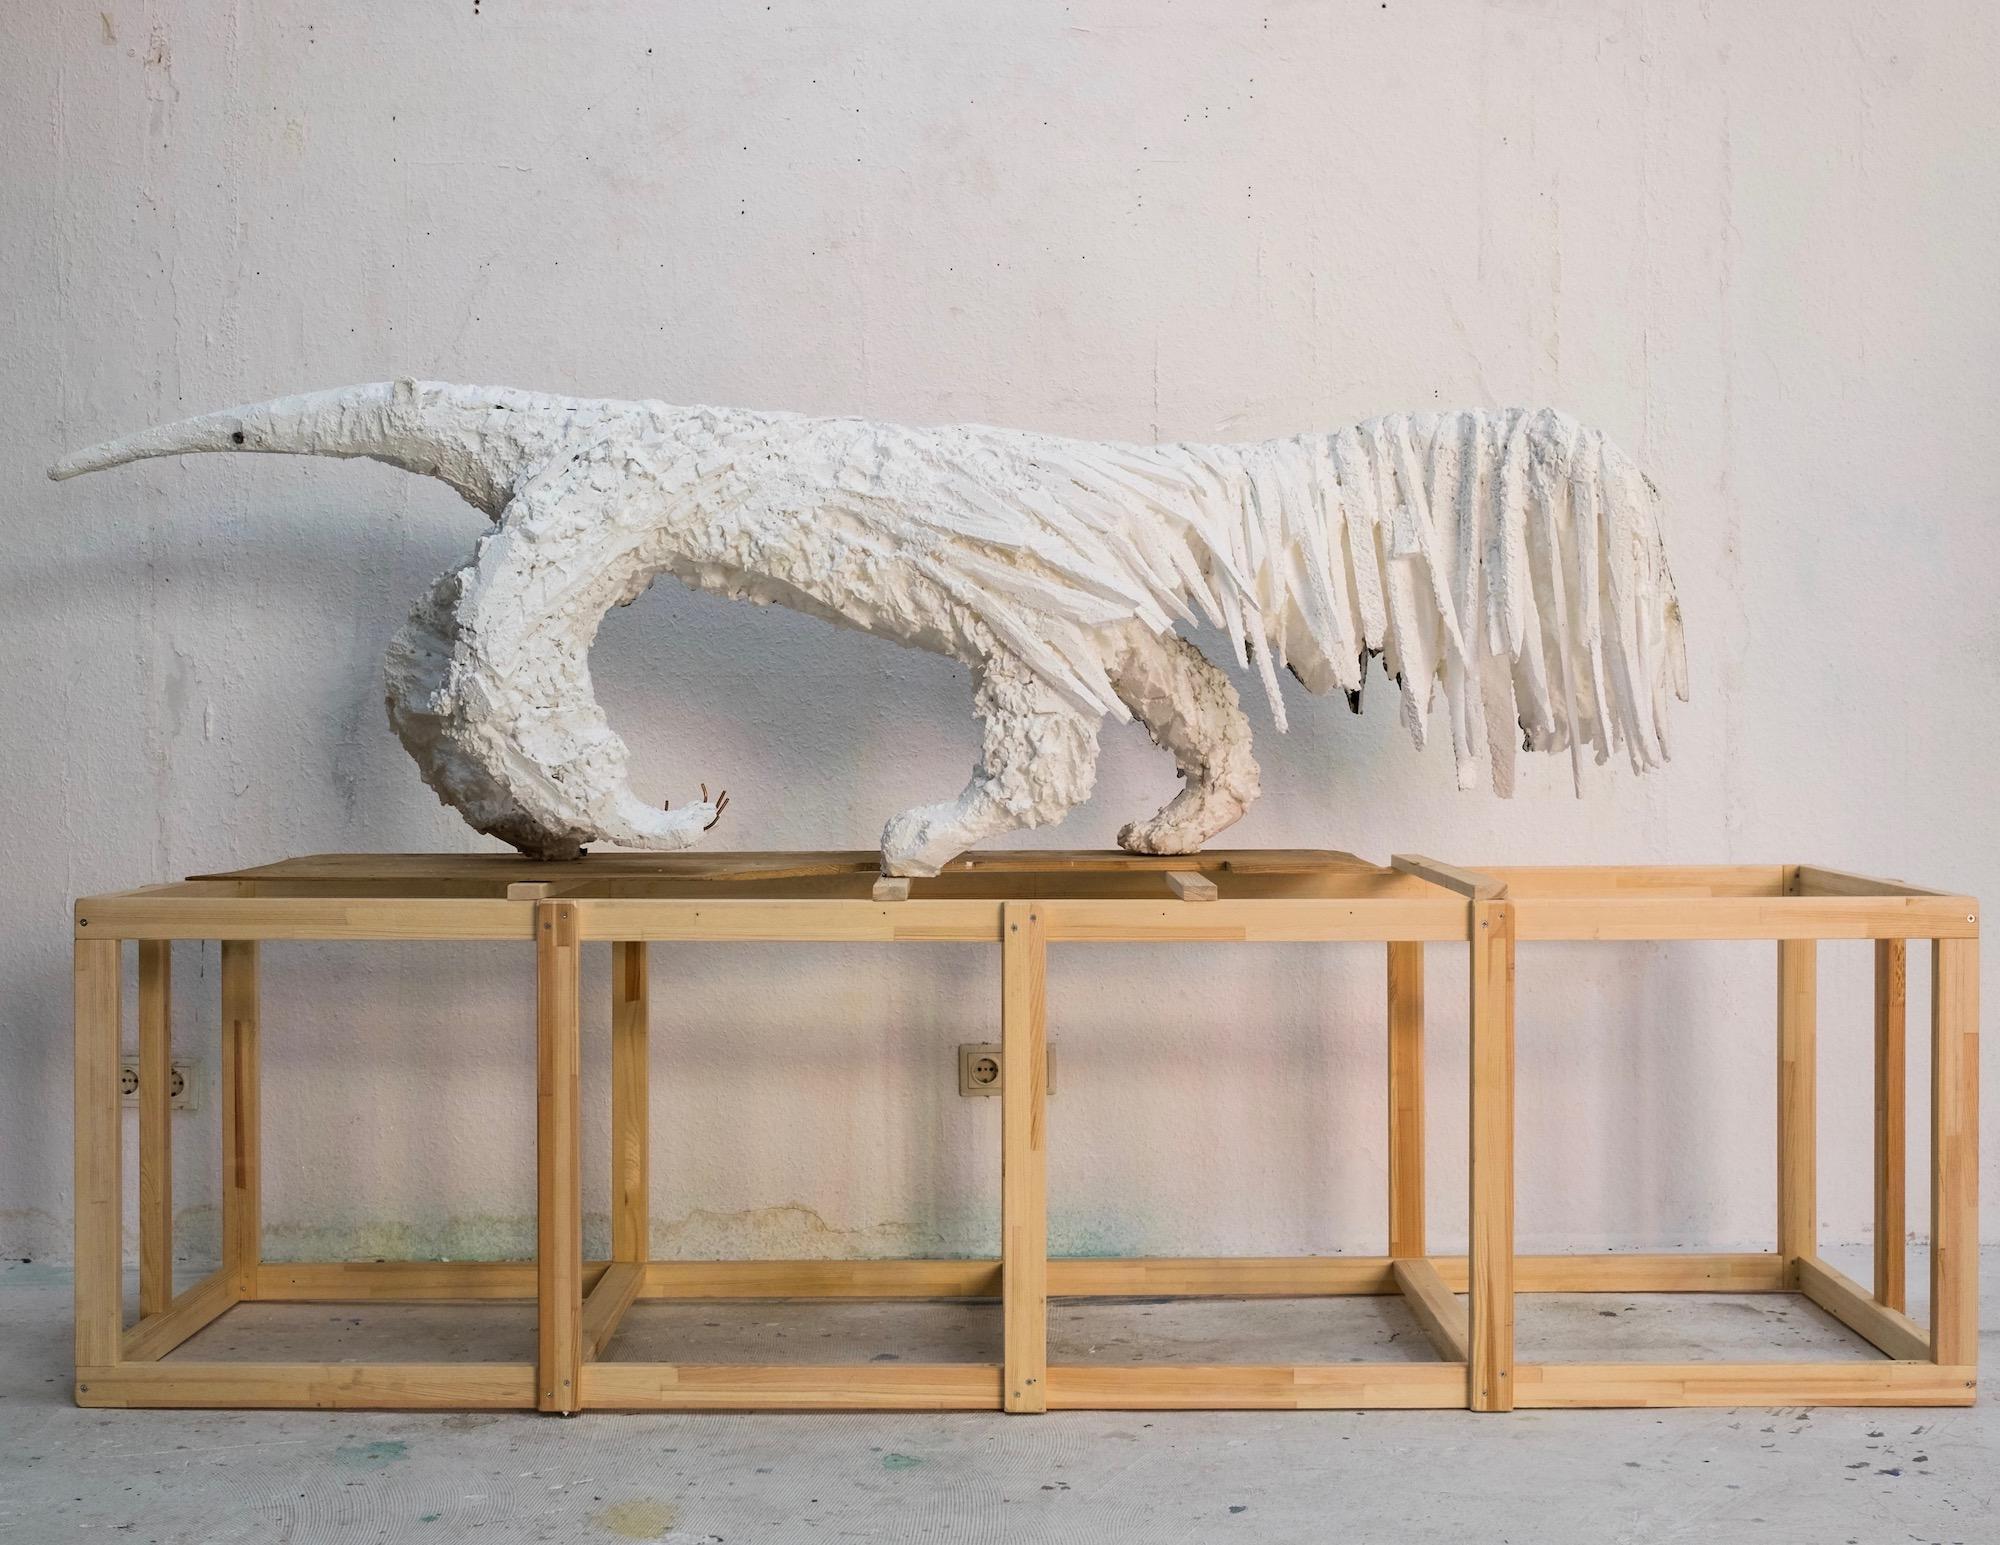 Lin May Saeed, Ameisenbaer /Anteater, 2018. Courtesy Jacky Strenz, Frankfurt; Nicolas Krupp, Basel and the artist